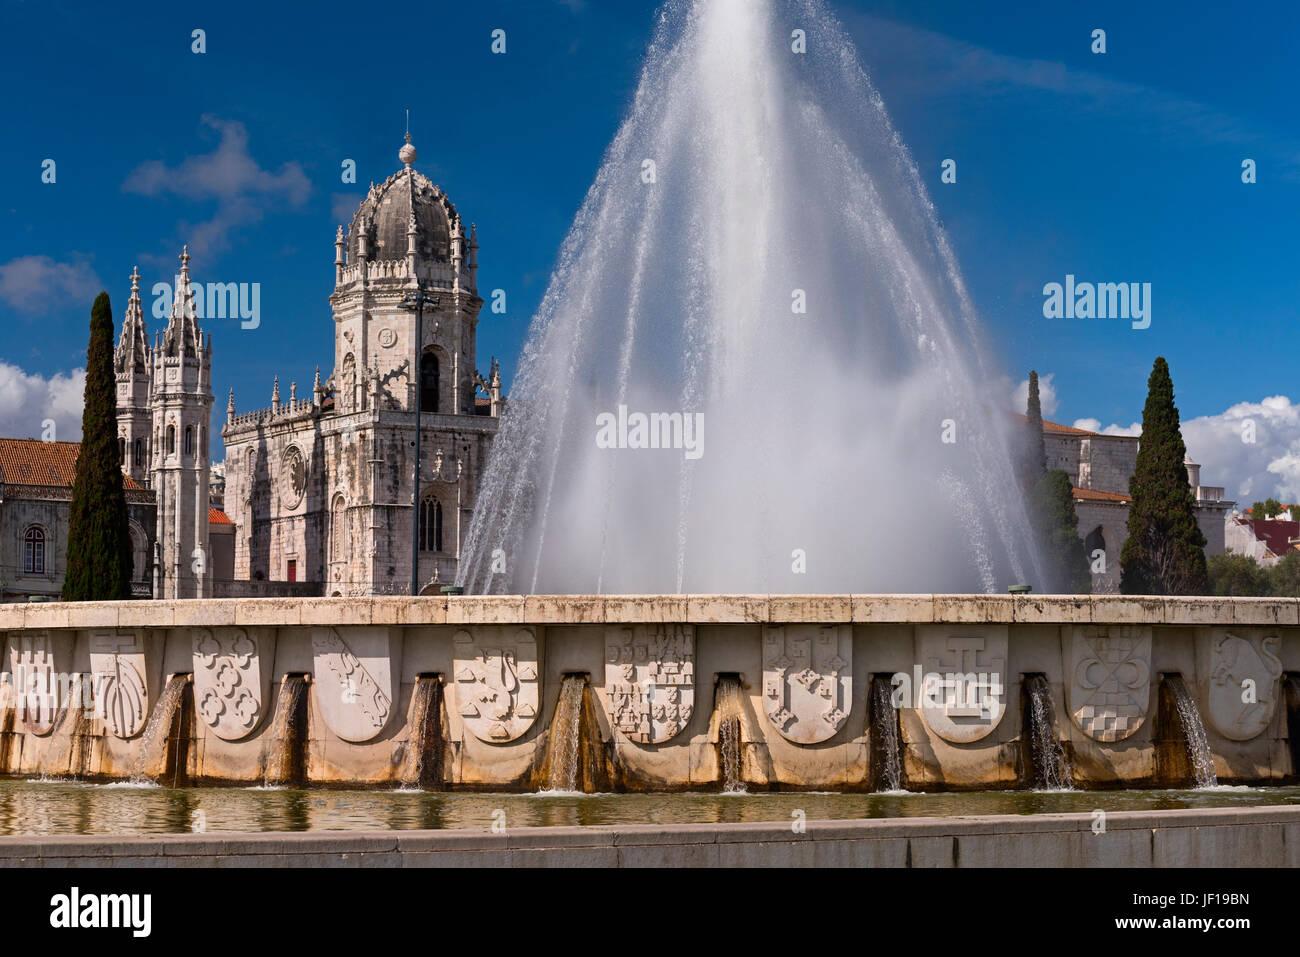 Mosteiro dos Jeronimos and fountain Belem Lisbon Portugal - Stock Image